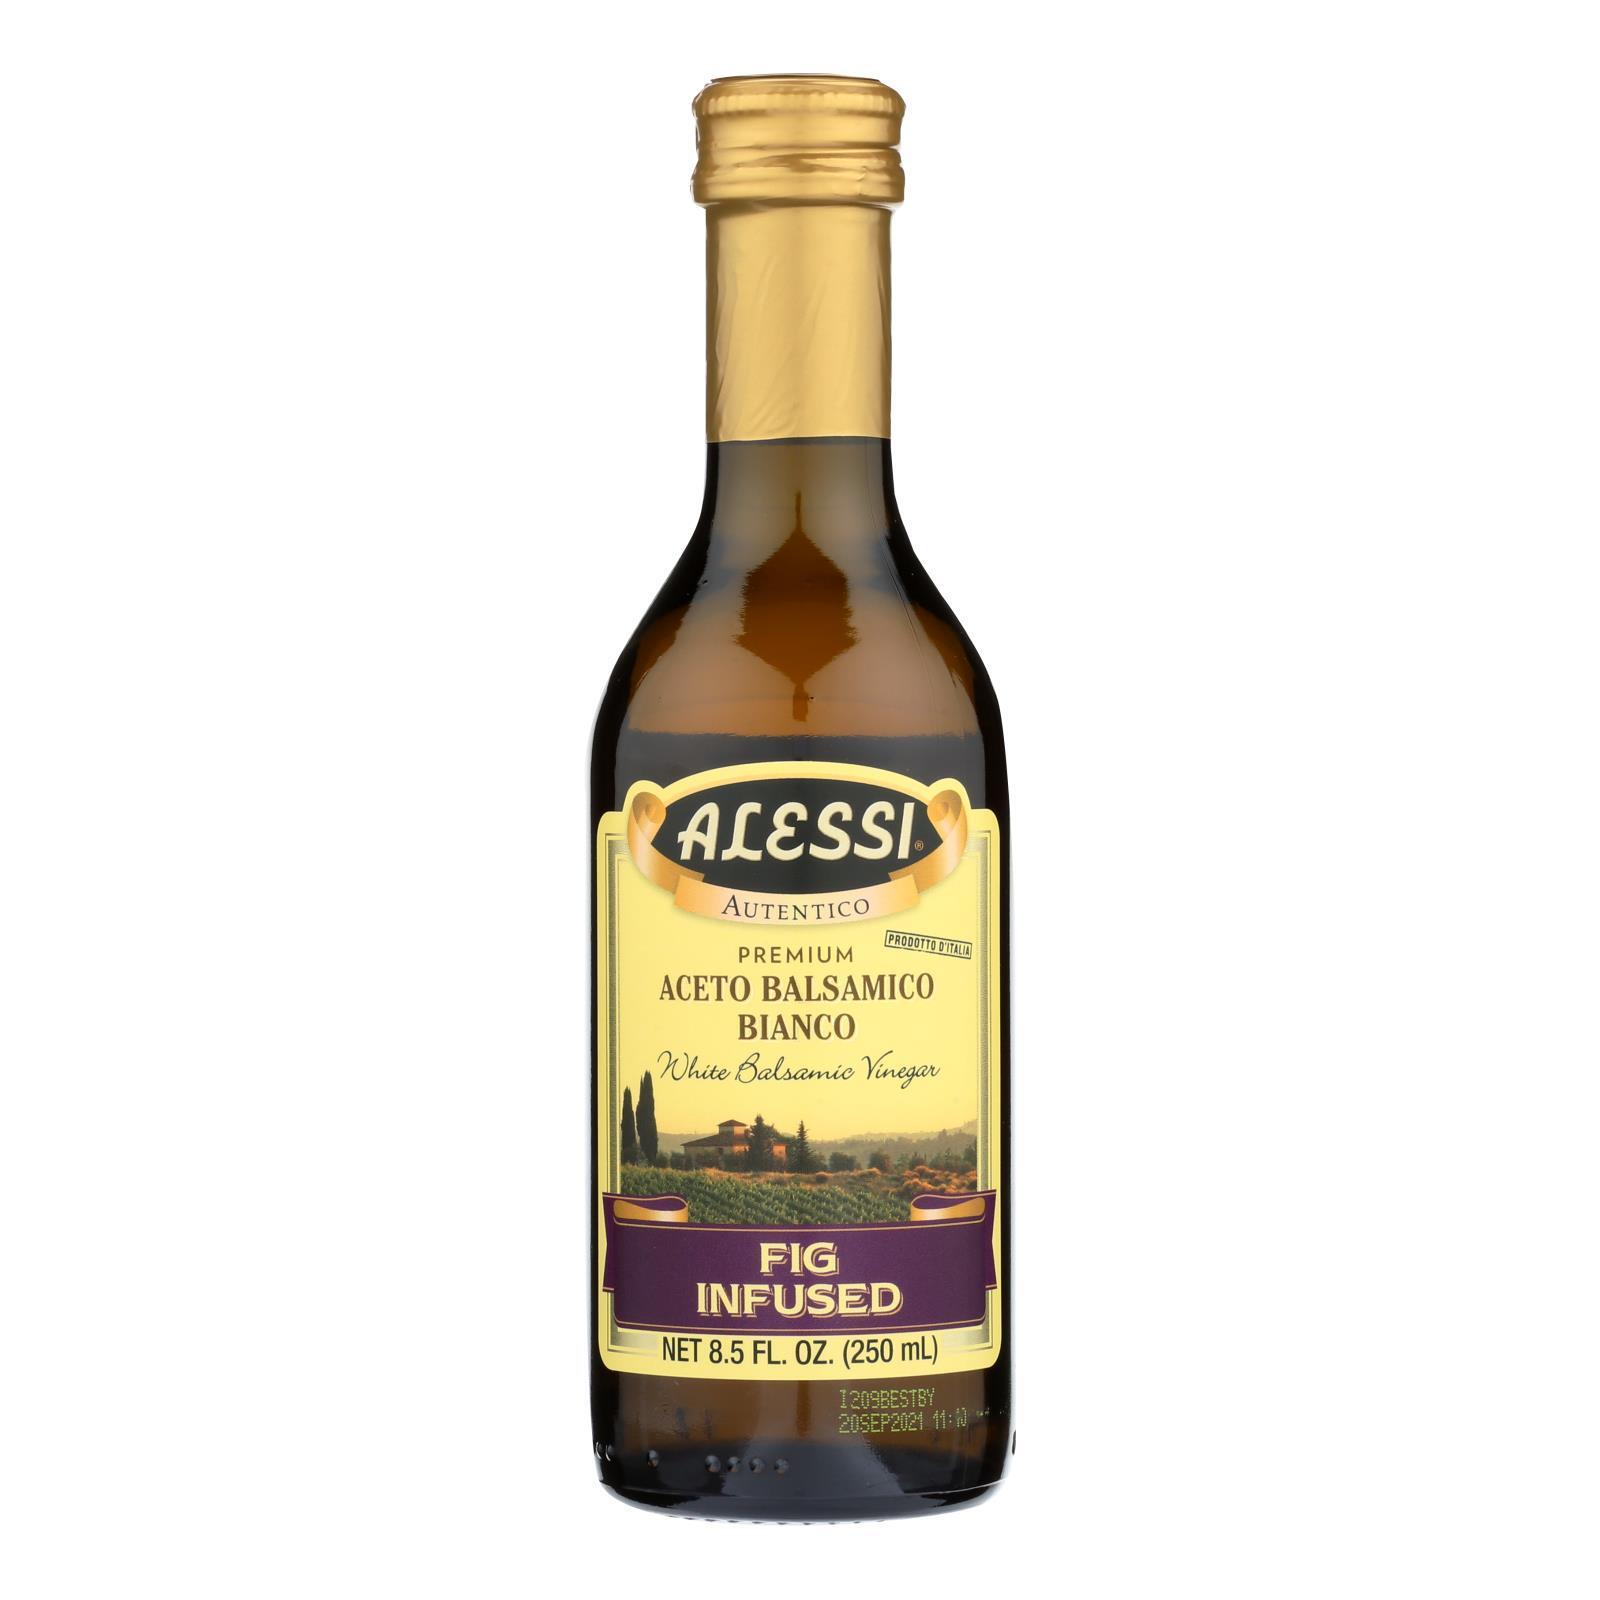 Alessi Fig Infused Vinegar - White Balsamic - Case of 6 - 8.5 FL oz.